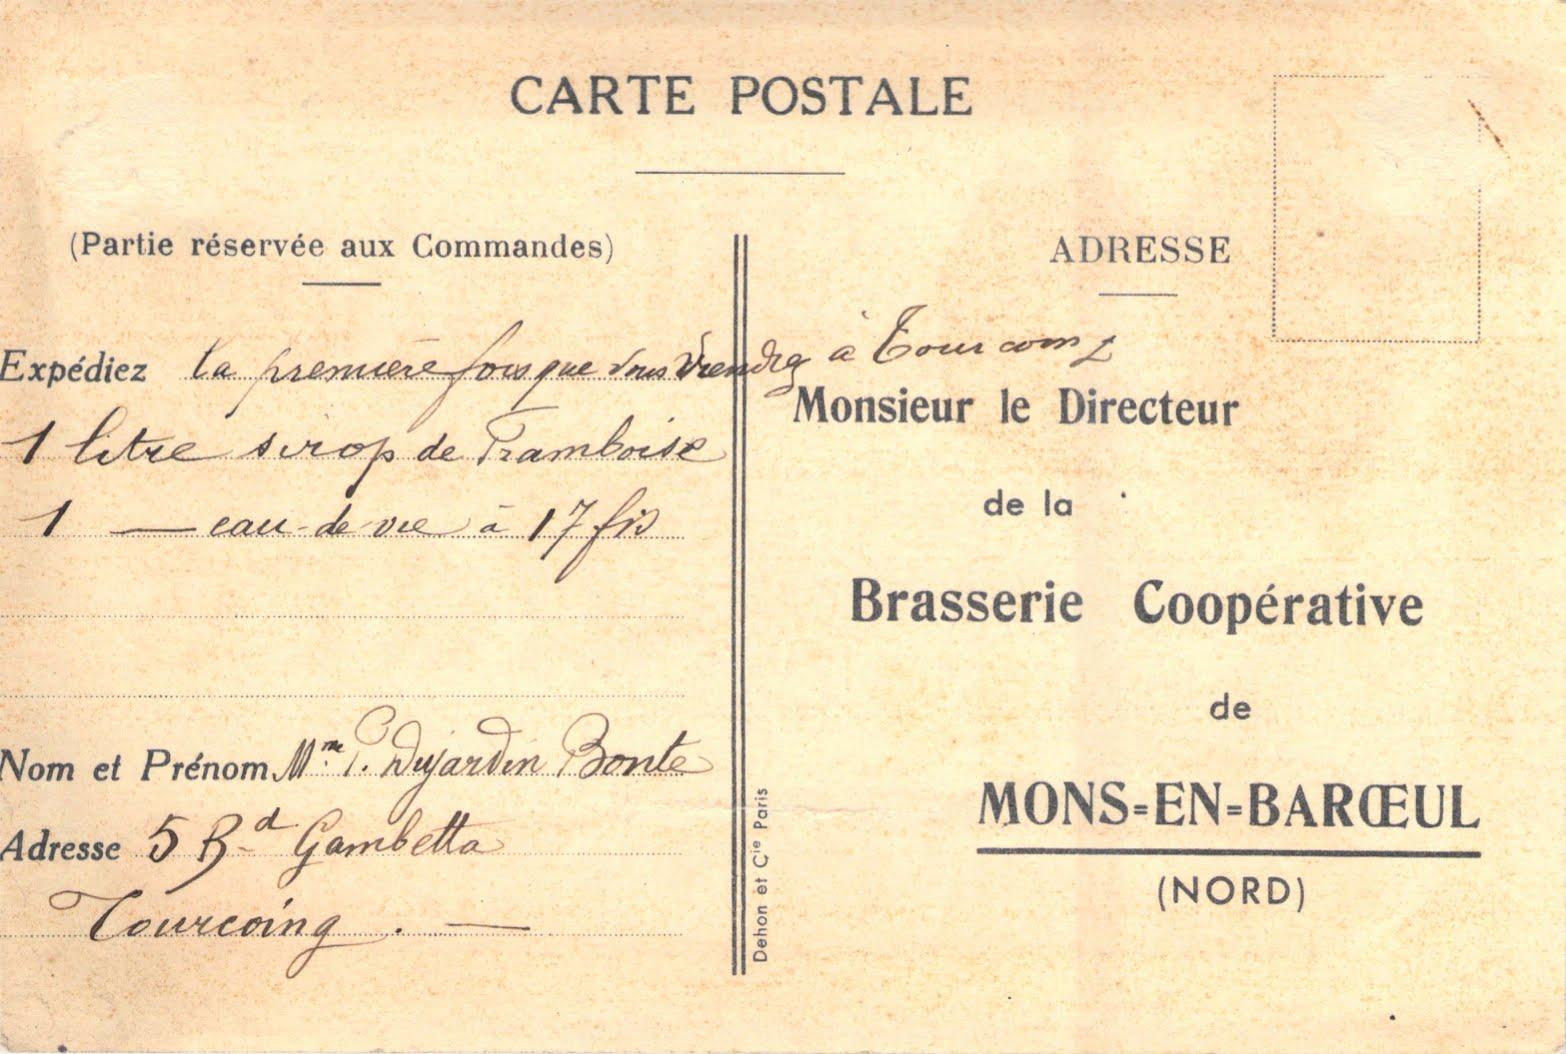 Cartes postales de la Brasserie